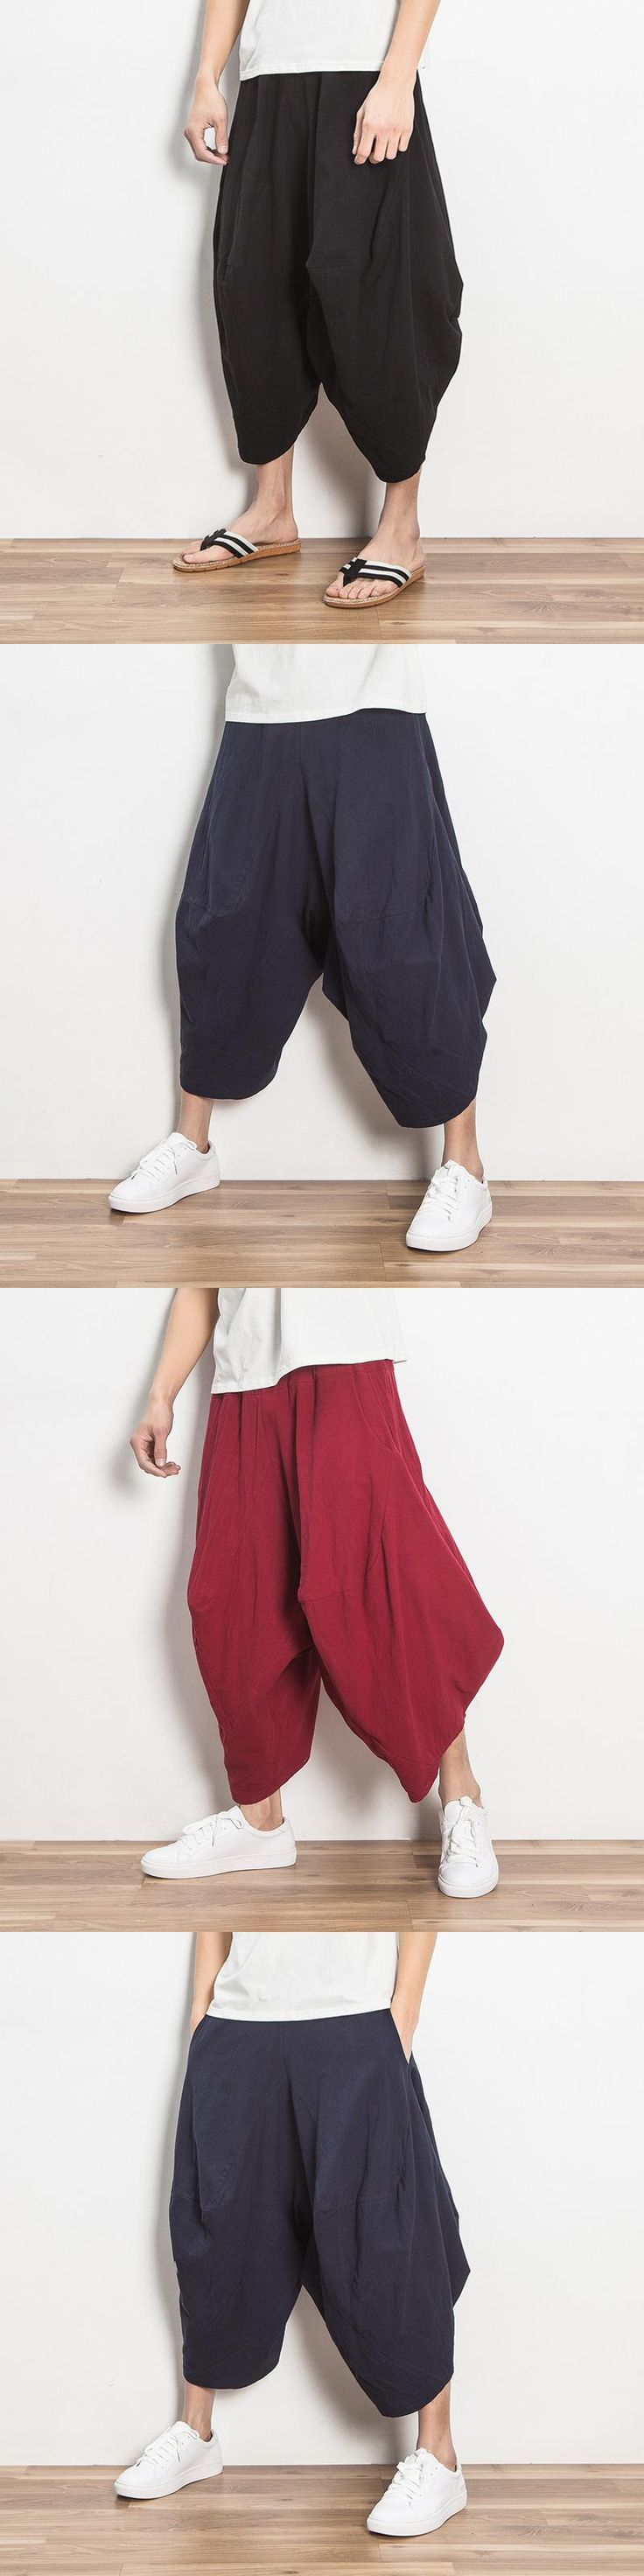 Hippie Baggy Wide Leg Pants Mens Outwear Casual Indian Drop Crotch Pants Summer Nepal Trousers Hawaii Dance Pants 050909